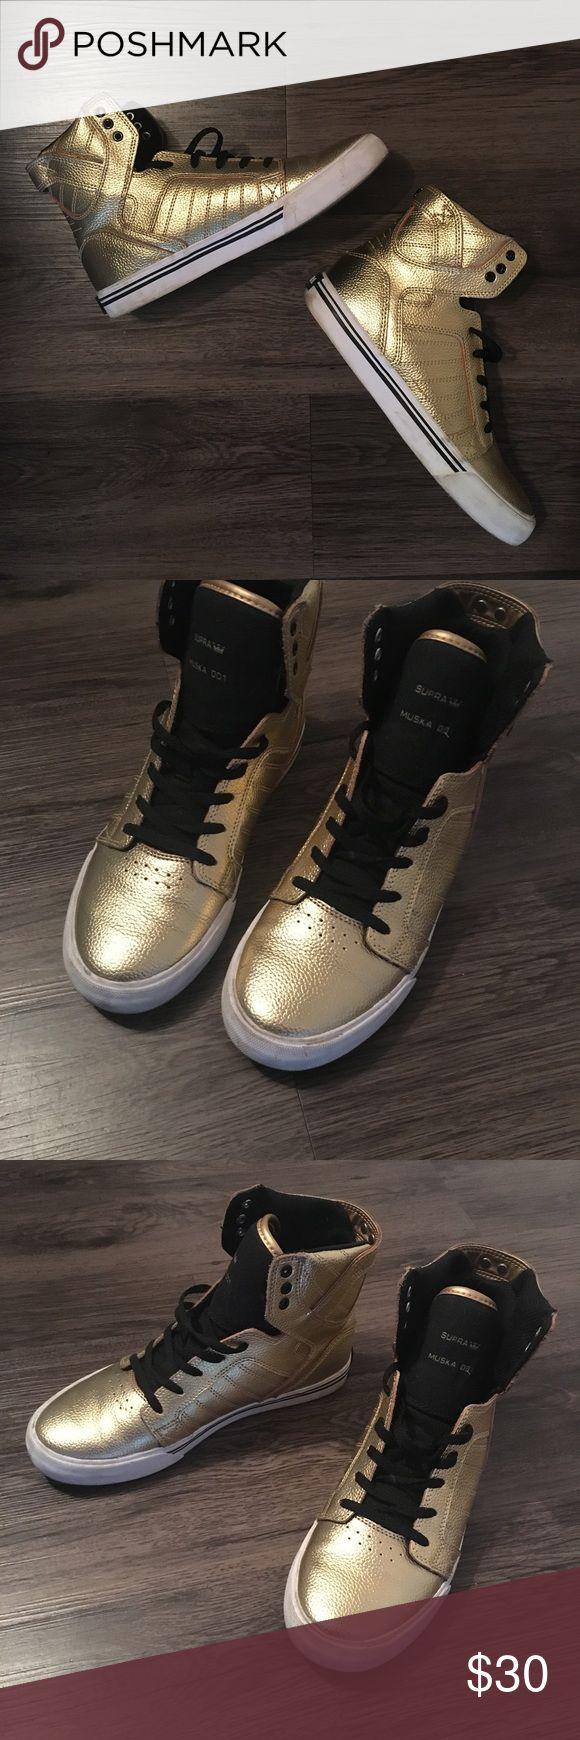 Gold Supra Skytop Muska 001 Kids size 6. Fit a women's 8. Very little wear. Supra Shoes Sneakers